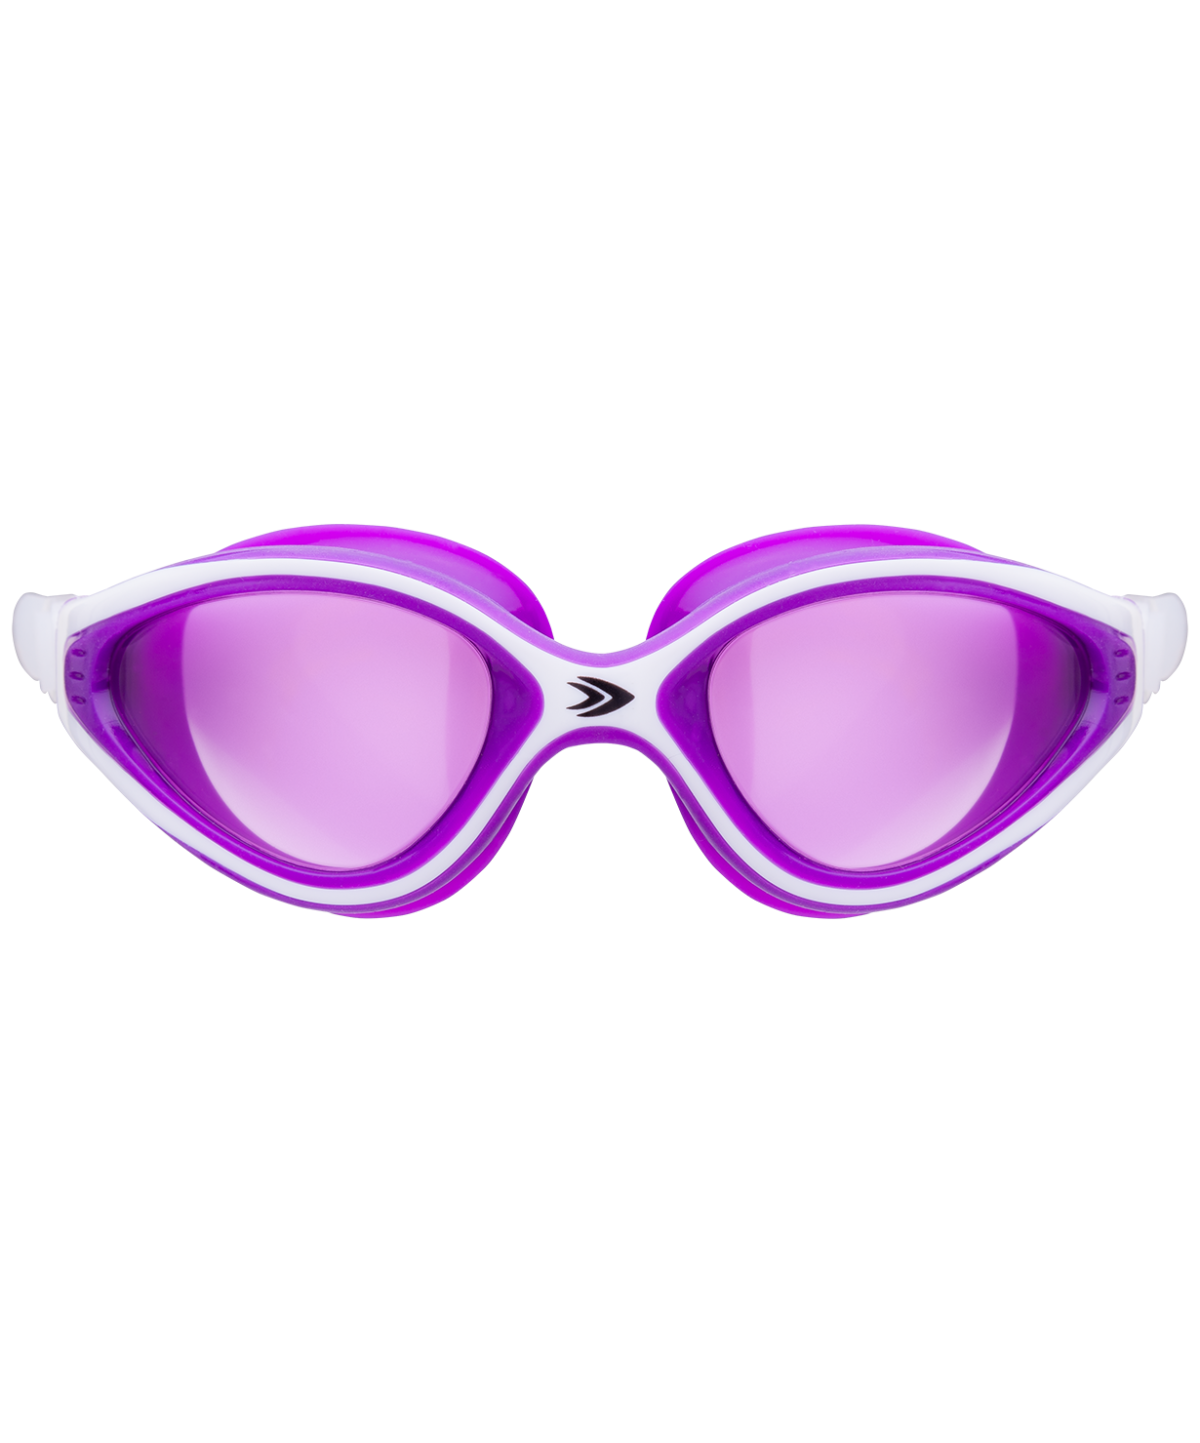 LONGSAIL Serena Очки для плавания  L011002: белый/фиолетовый - 2